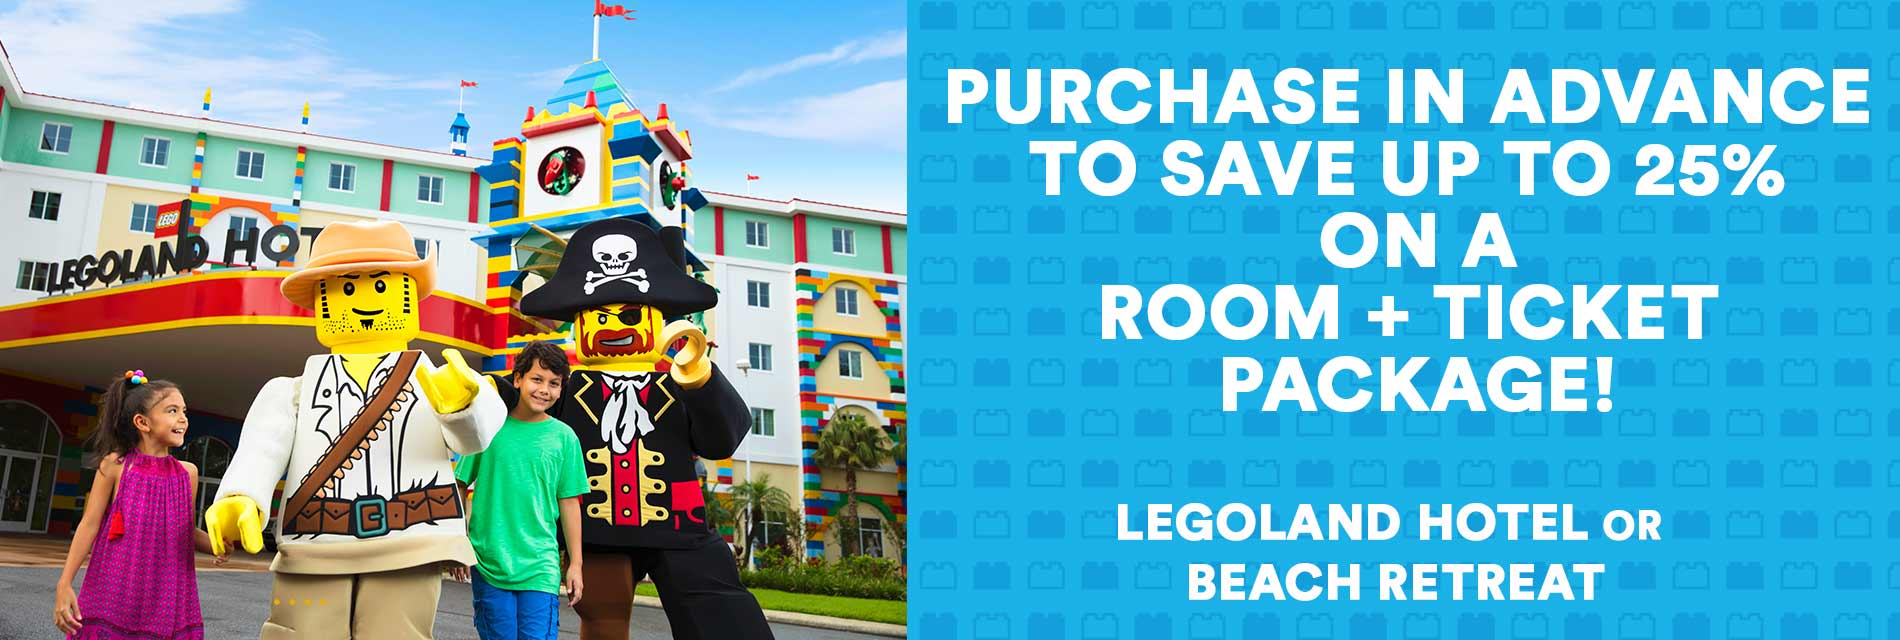 Legoland florida coupons 2019